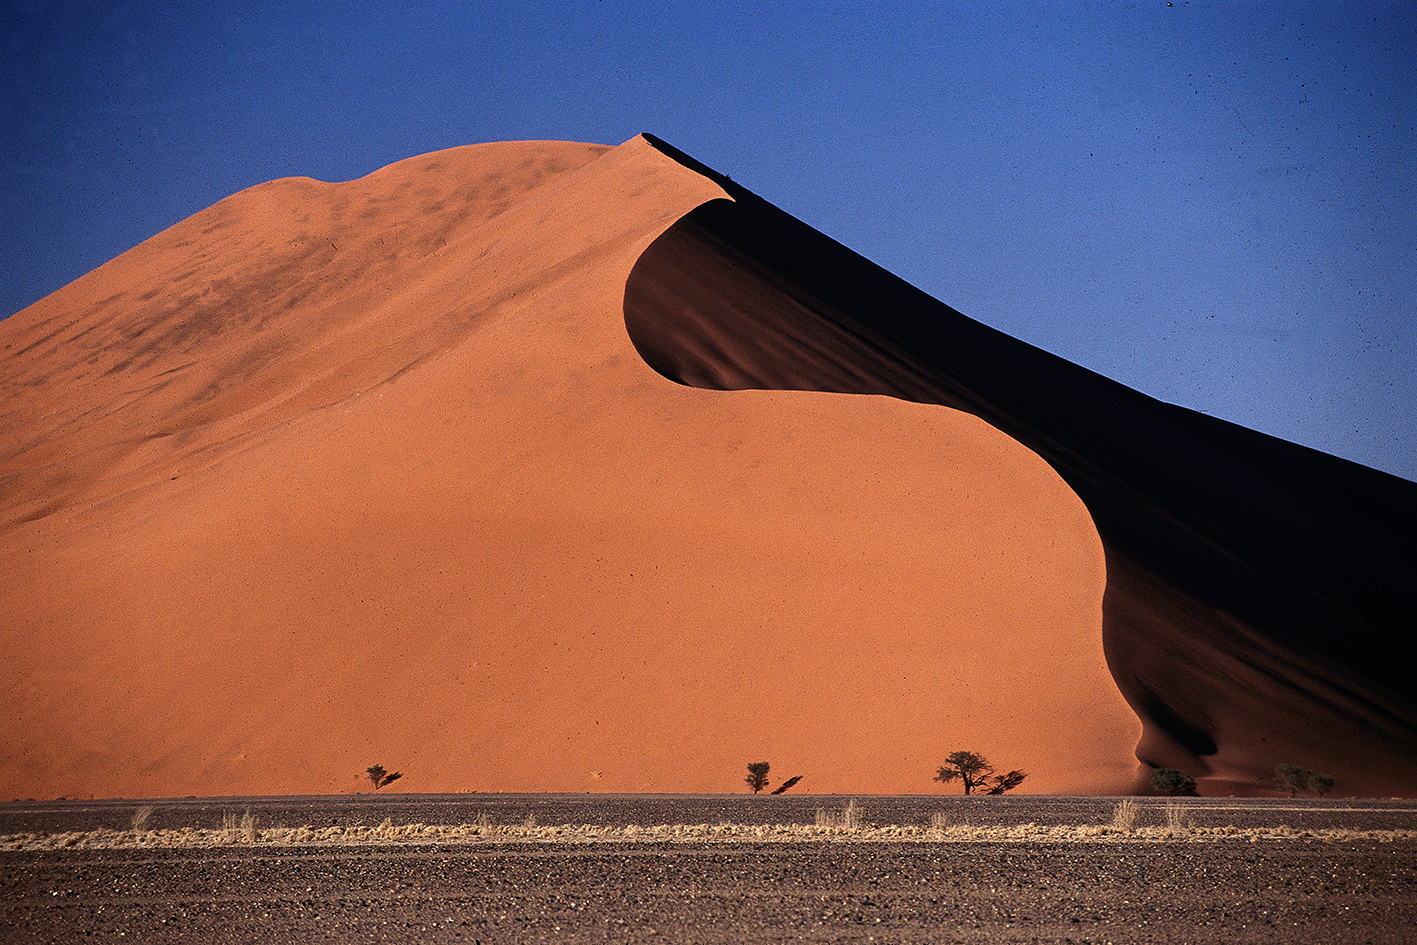 Duna. Sesriem, Namibia